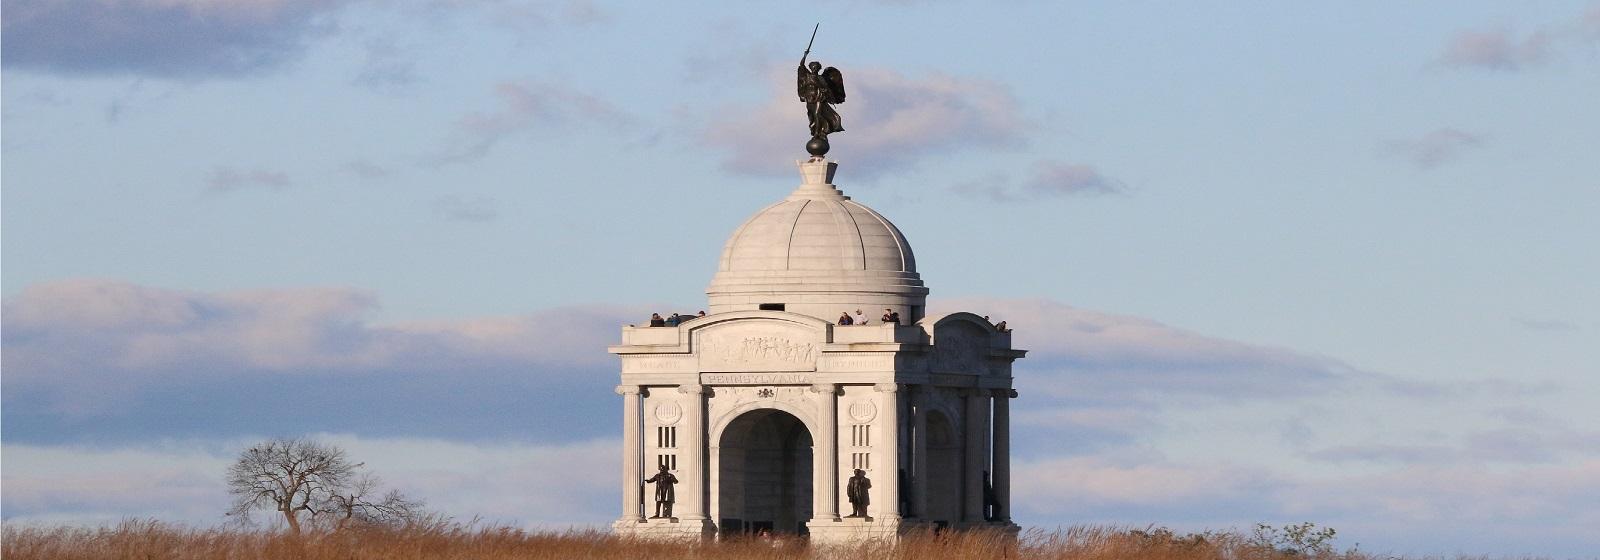 Things to do in Gettysburg